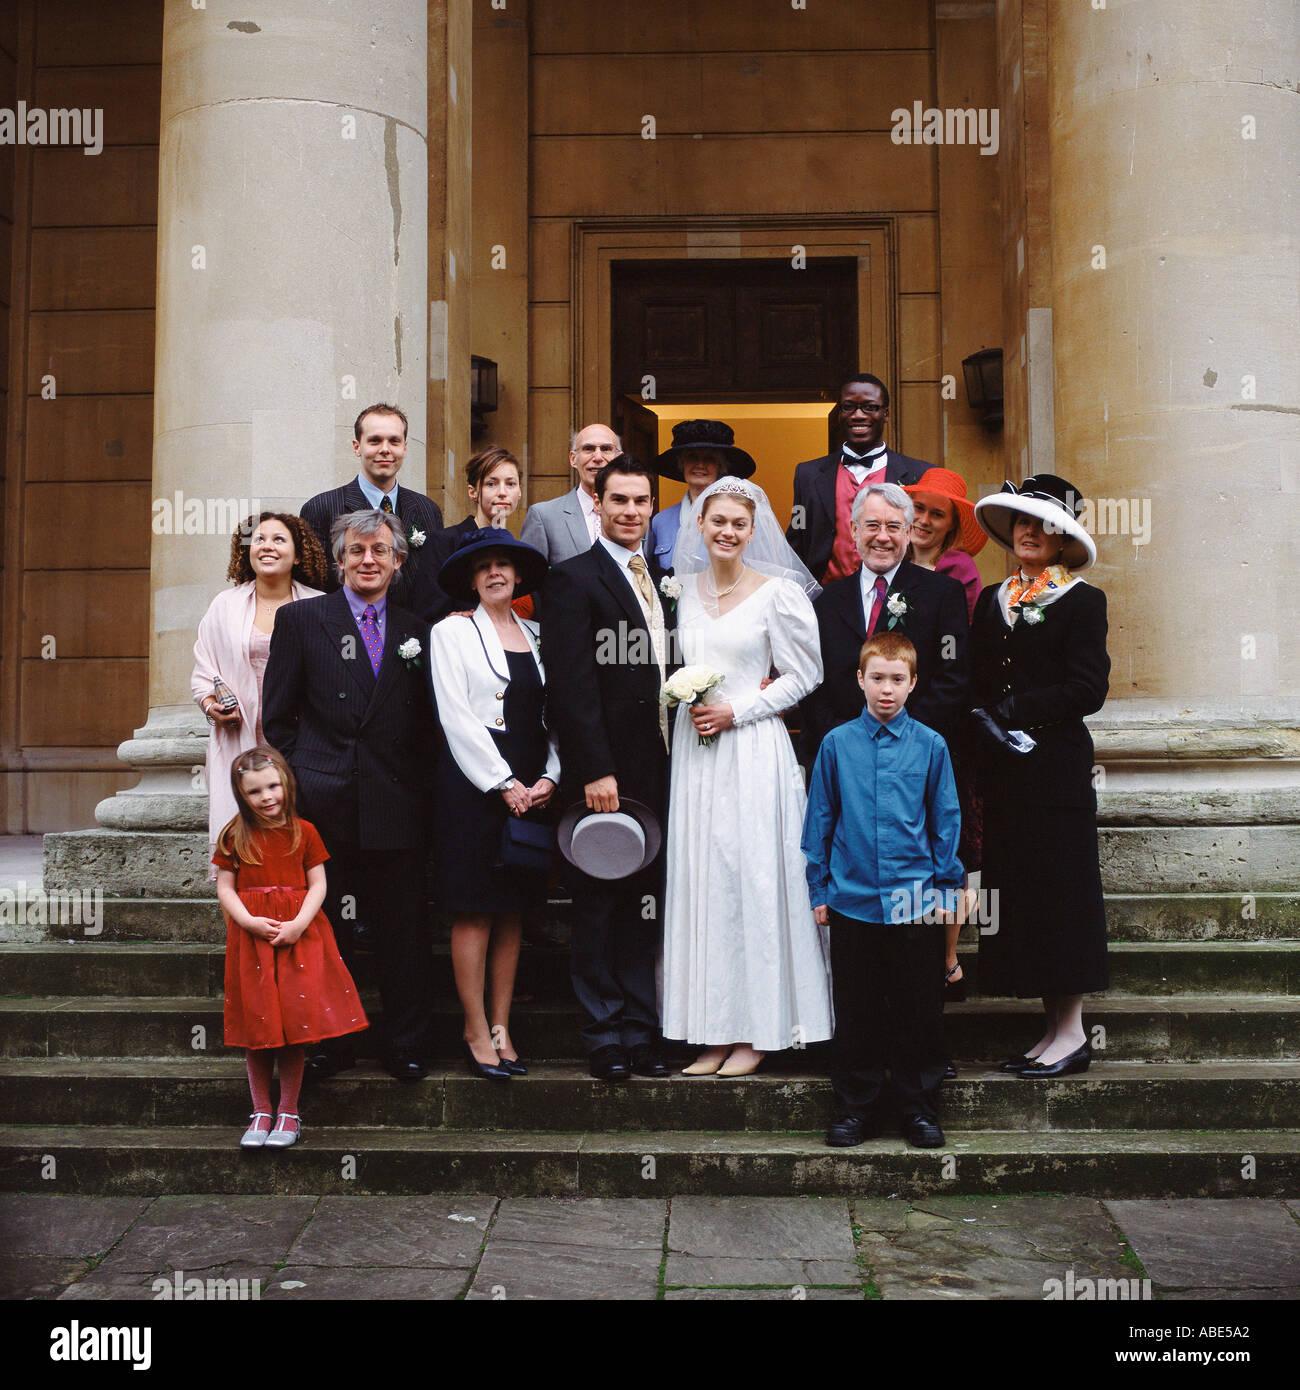 Family photograph - Stock Image